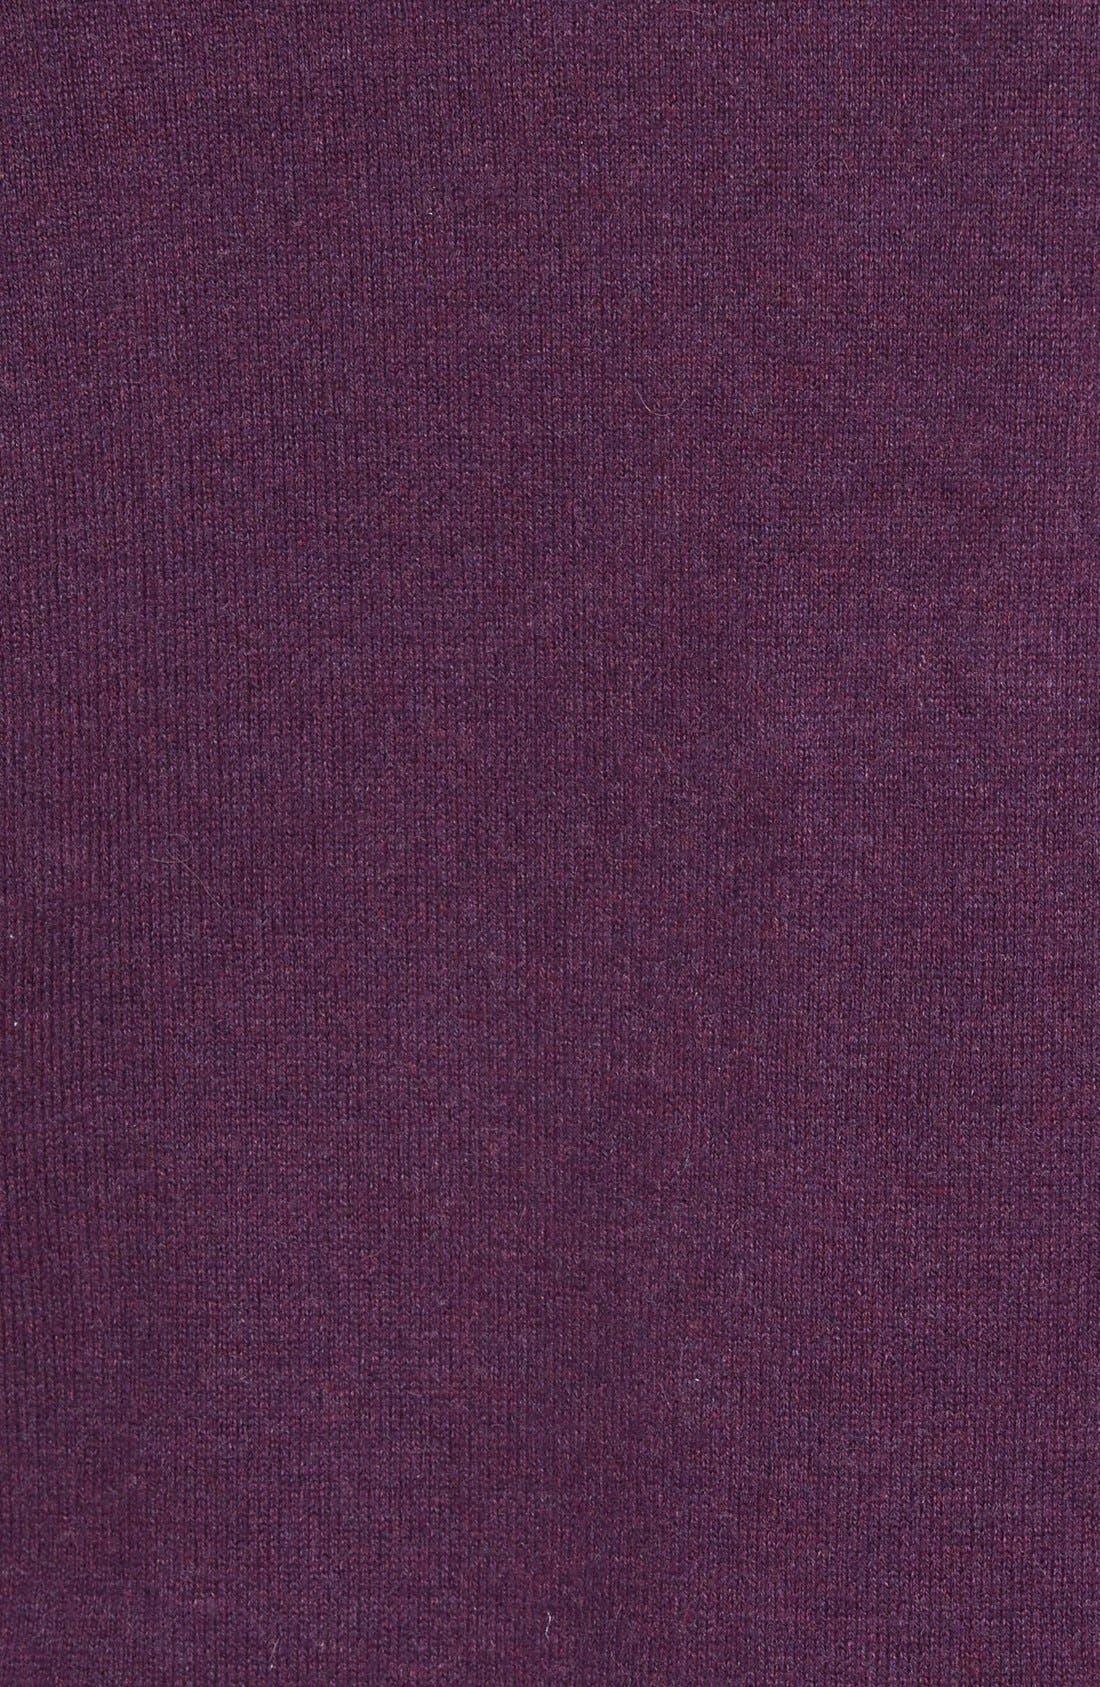 'Jersey Sport' Cotton Blend Crewneck Sweater,                             Alternate thumbnail 38, color,